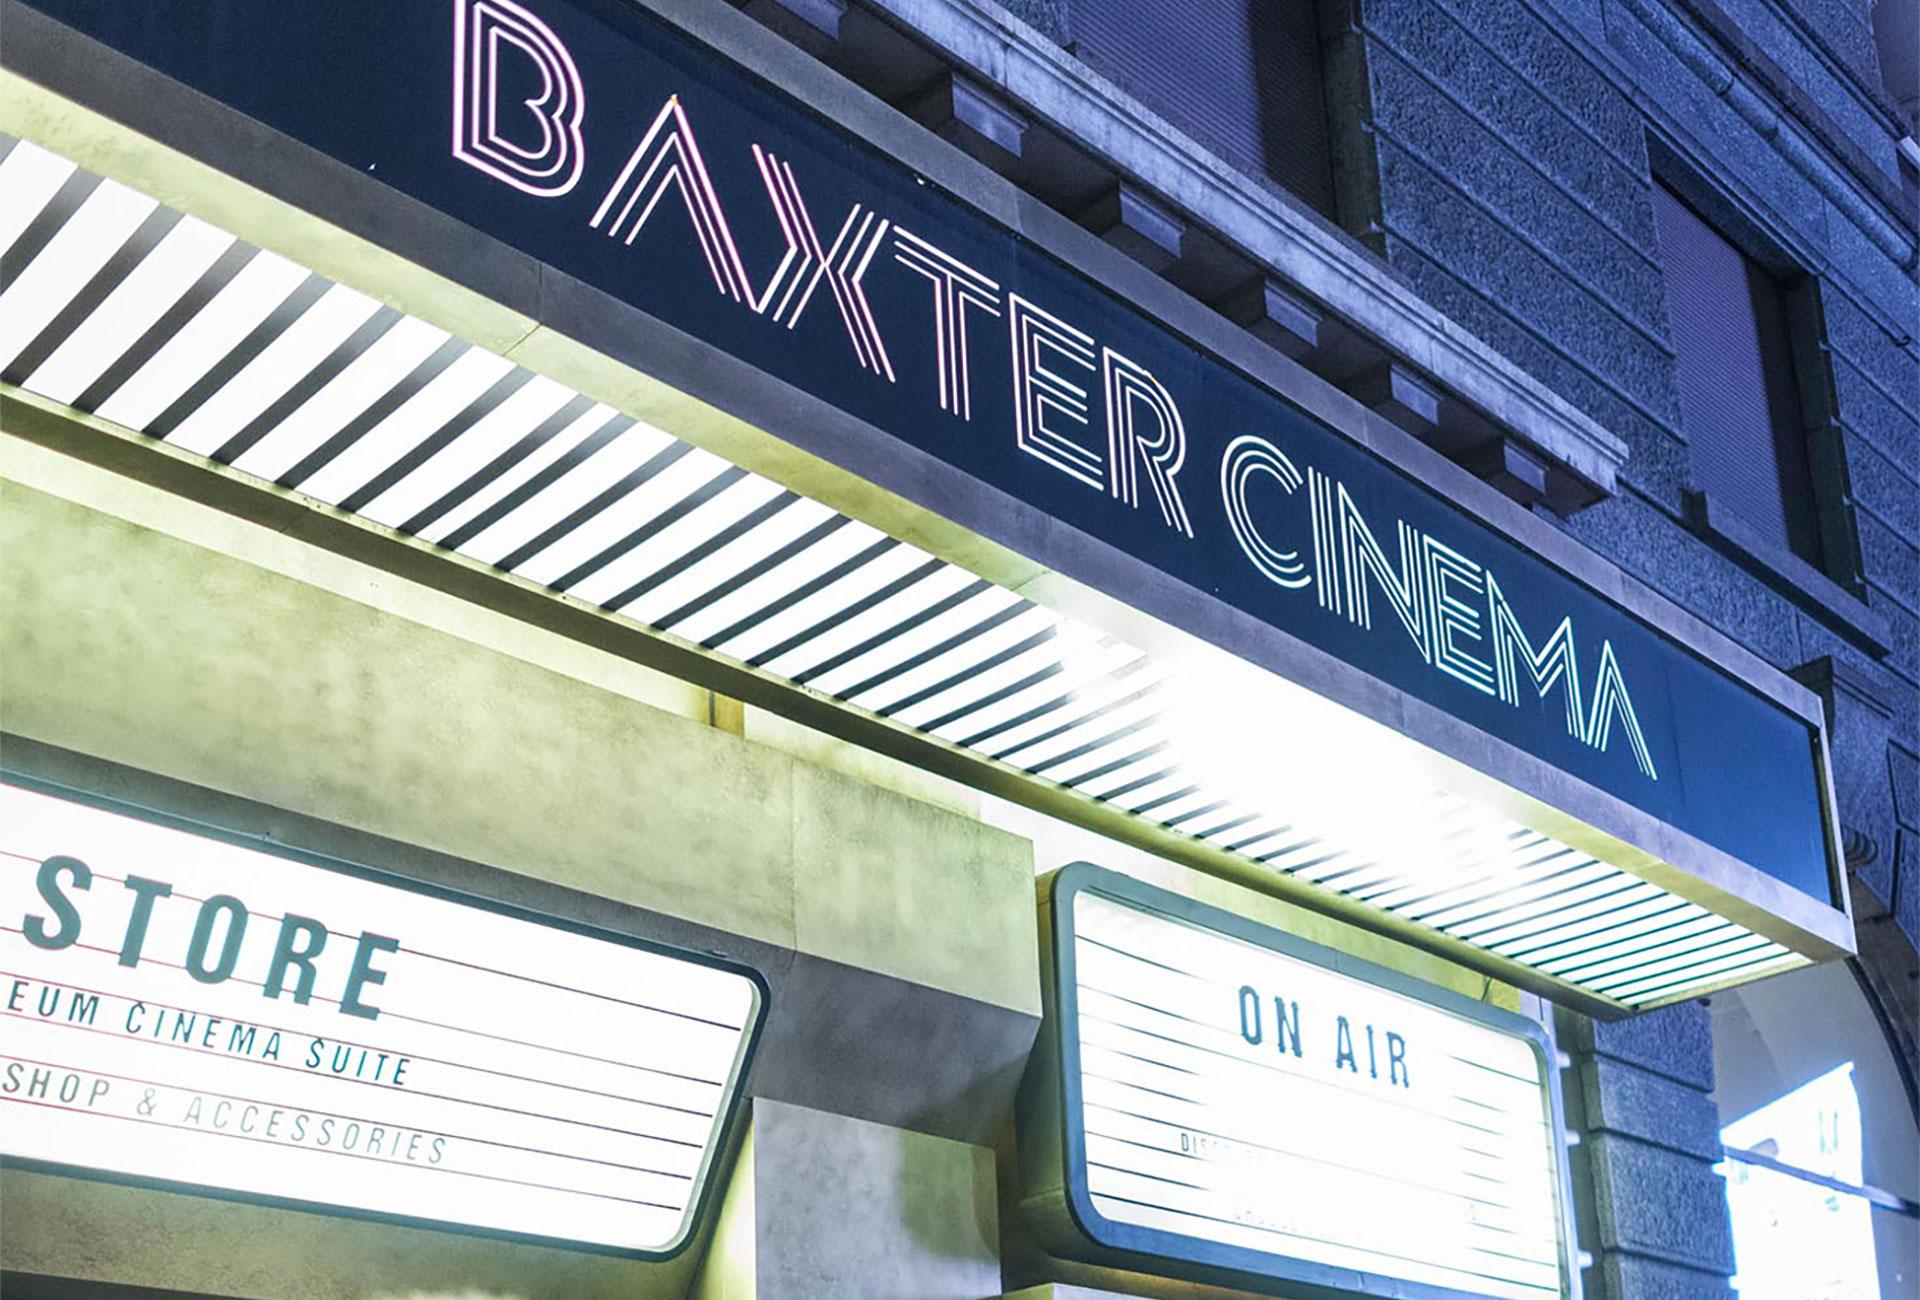 BAXTER CINEMA | PARTY FUORISALONE 2018